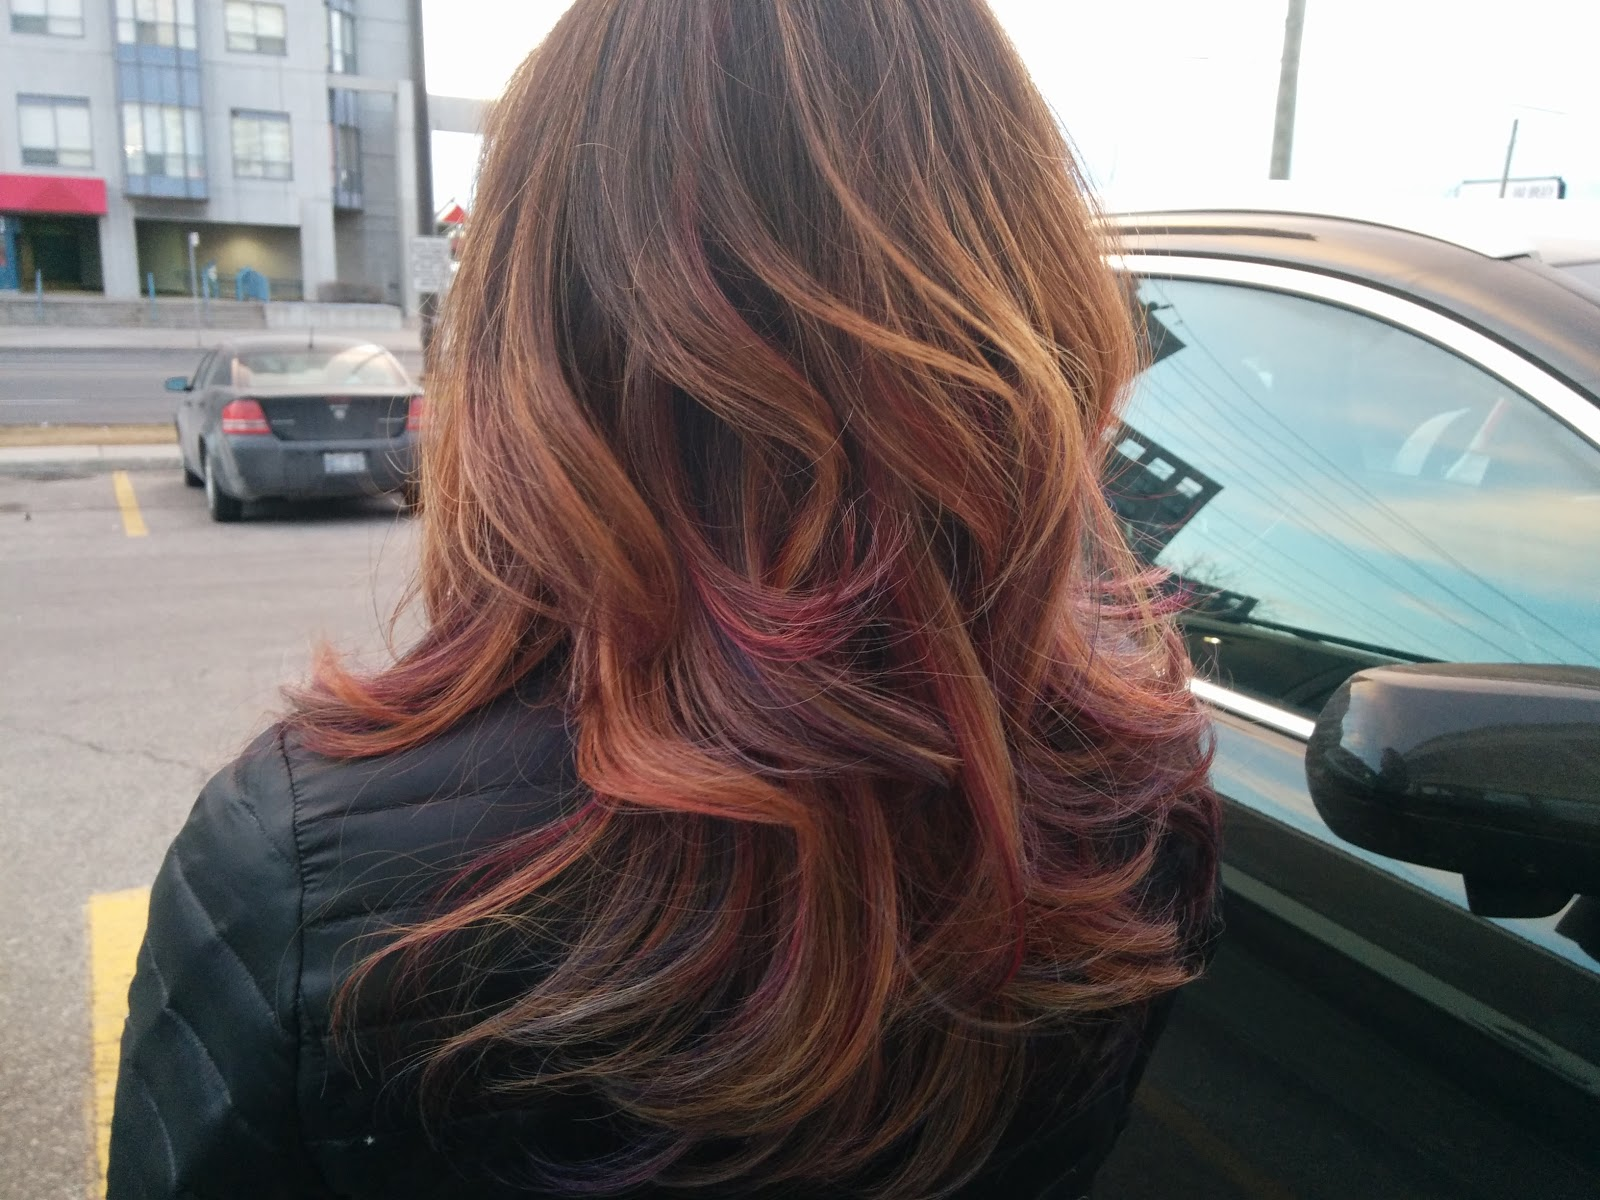 Lisasobsessions Rainbow Hair Balayage With Honey Highlights On